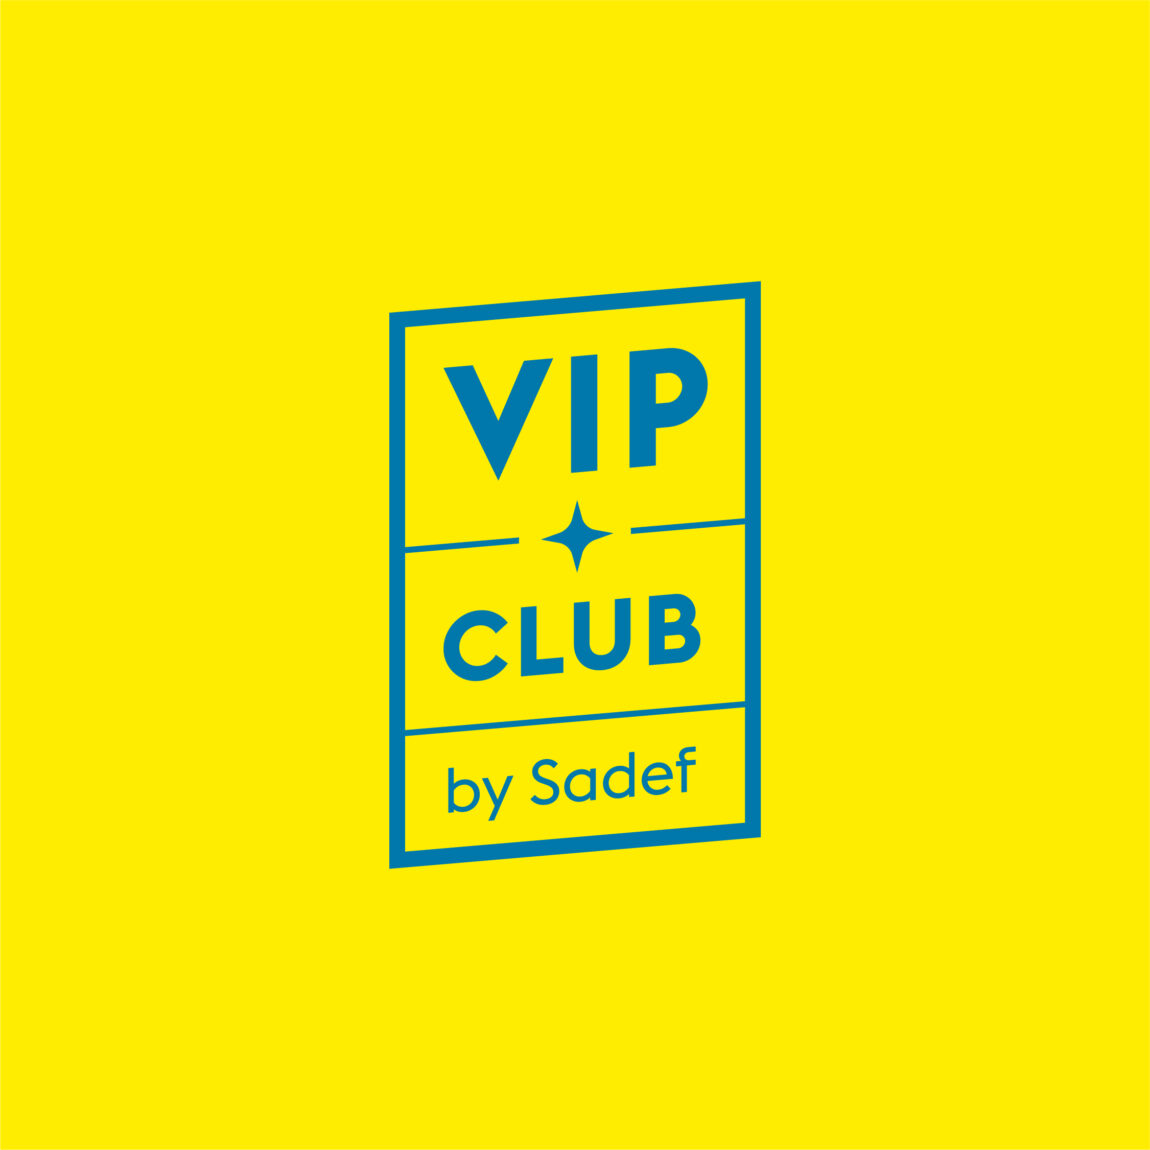 Sadef VIP Facebook Omslagfoto 2020 Q3 v1 varianten lores